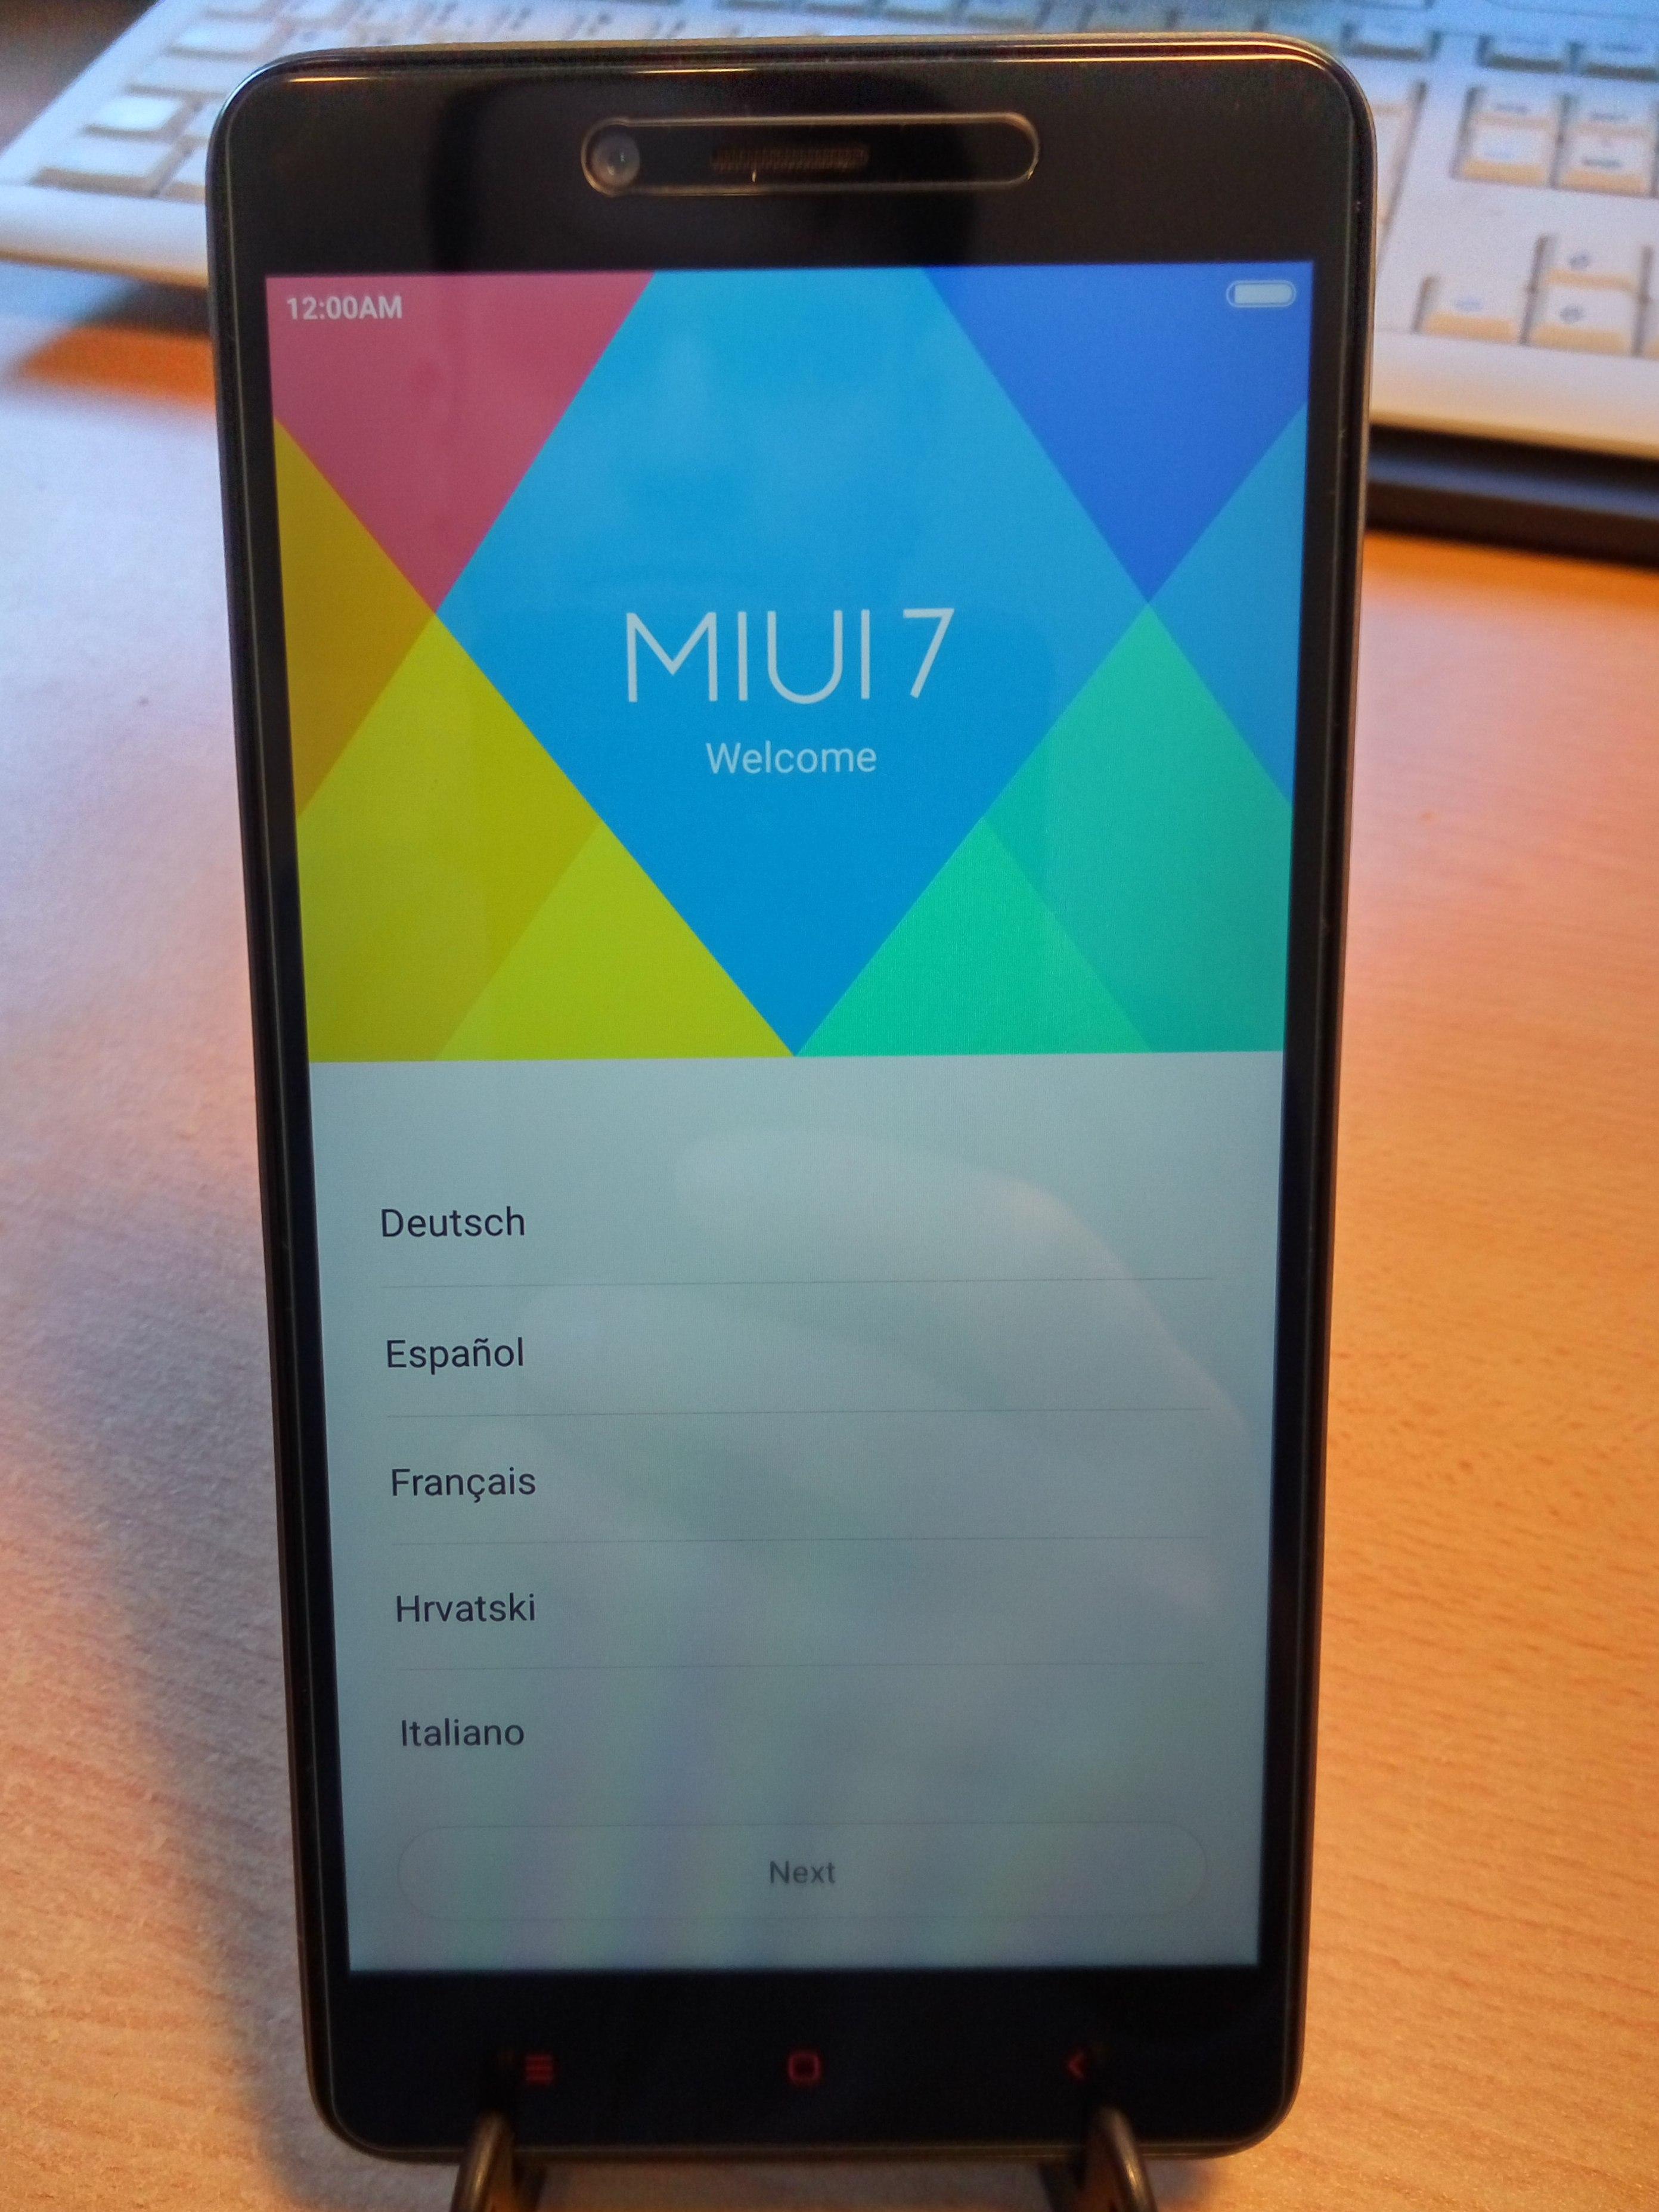 Kurzreview Xiaomi Redmi Note 2 Prime 55 Smartphone Mit Tempered Glass